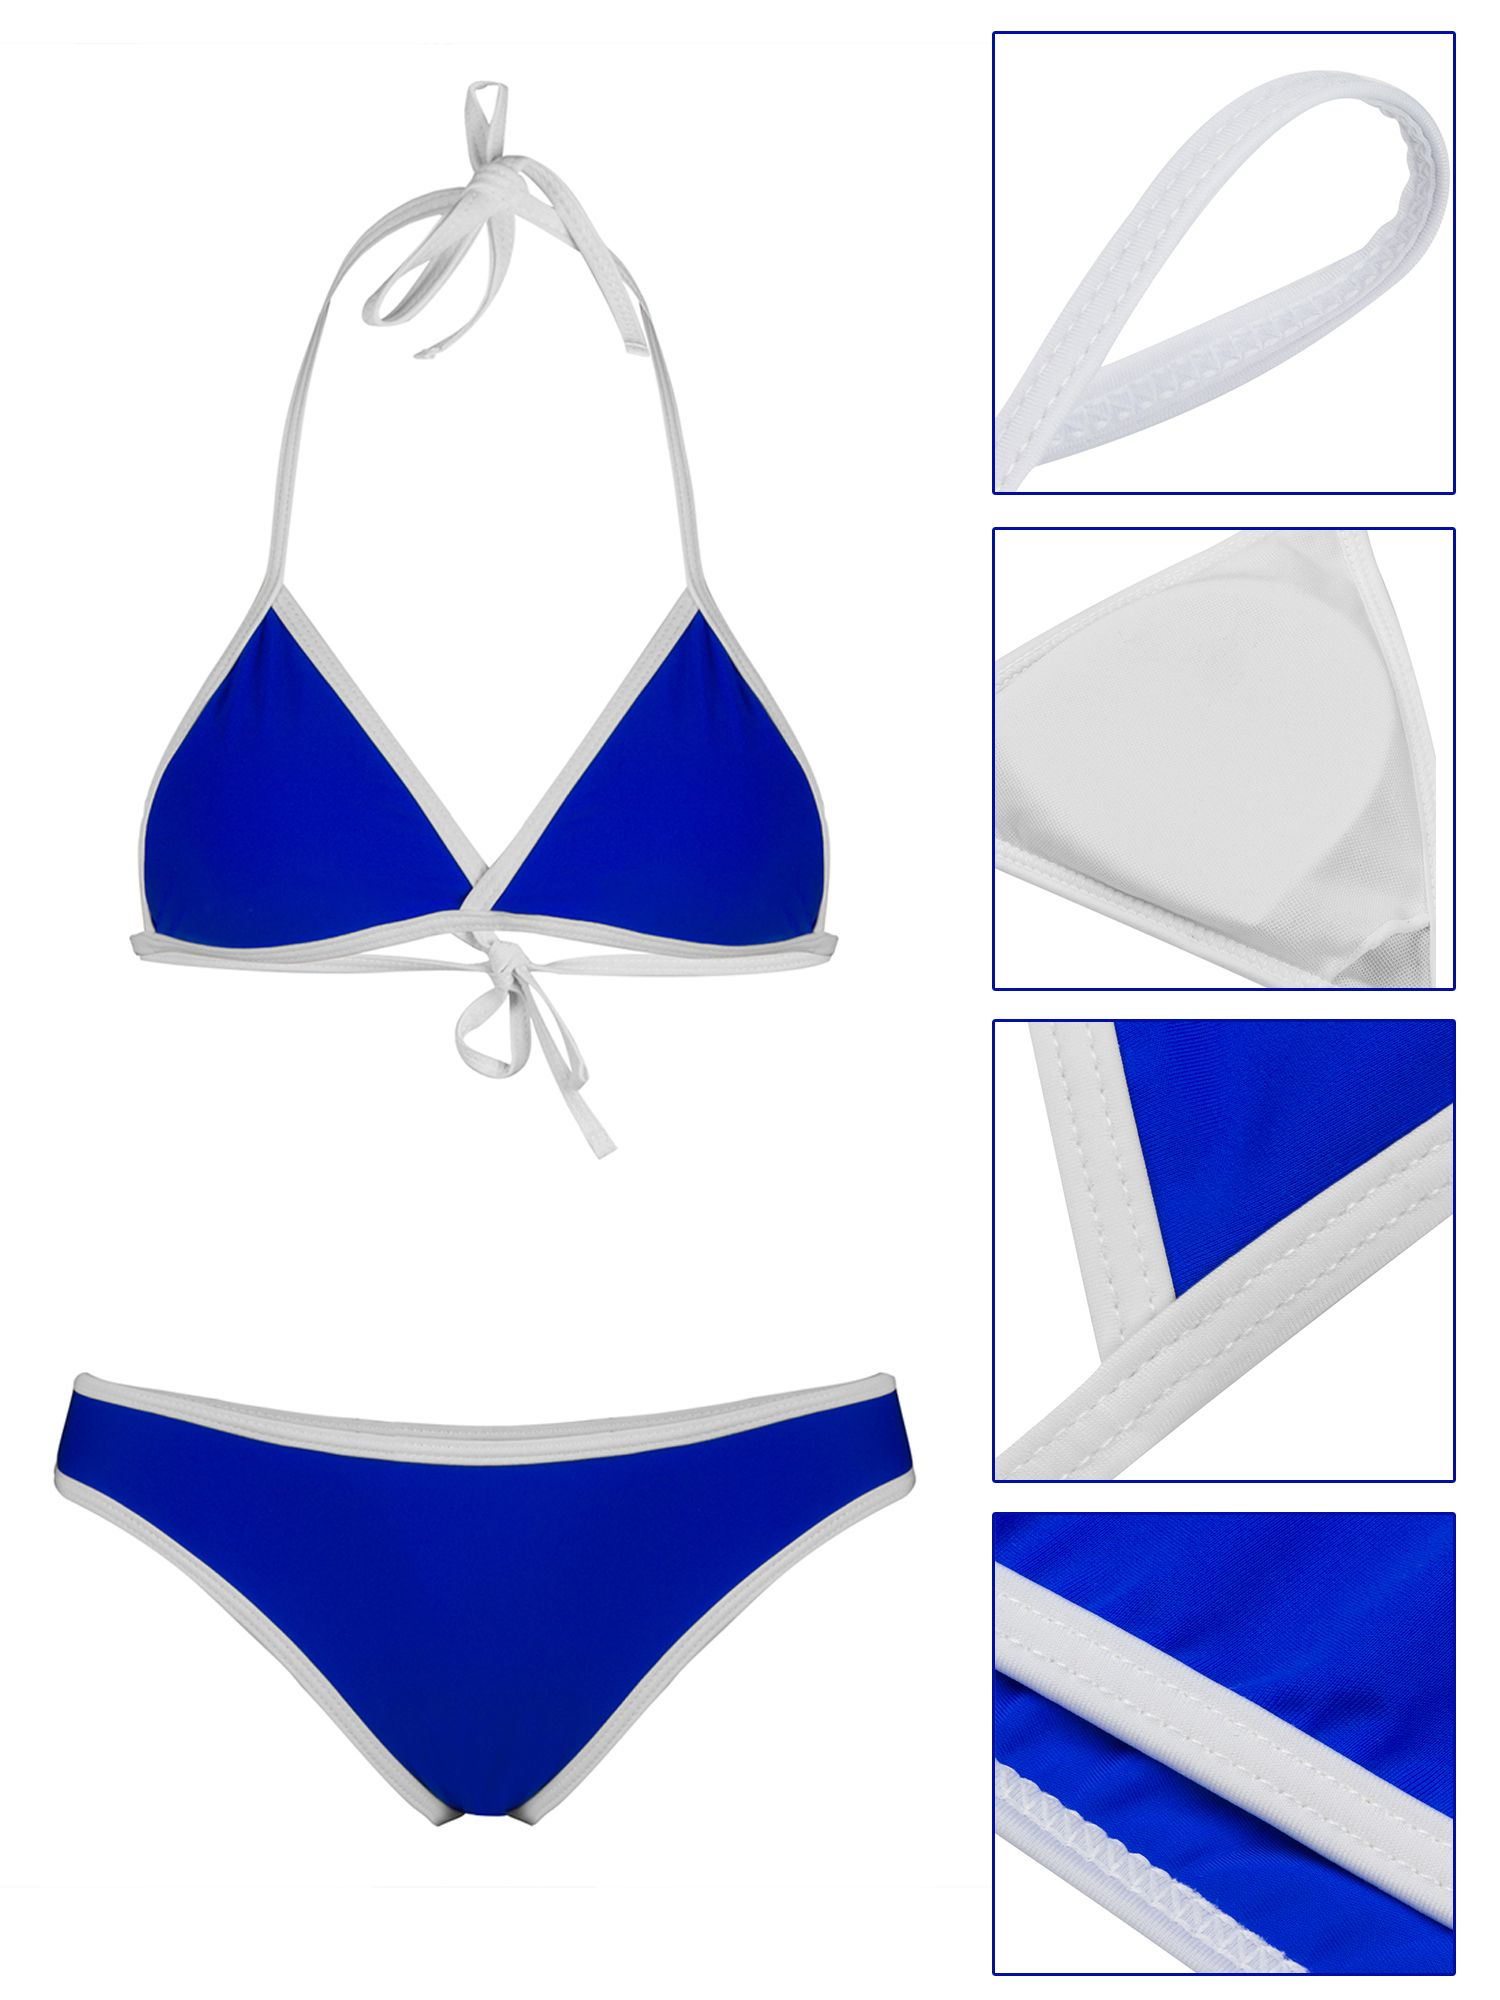 74e5d7faab98d Phoebe Cat Womens Swimwear Bikini Set for Summer Beach, Summer Two Piece  Bandage Push-Up Padded Swimsuits for Women, P2882AGM Two Piece Bathing  Swimwear ...